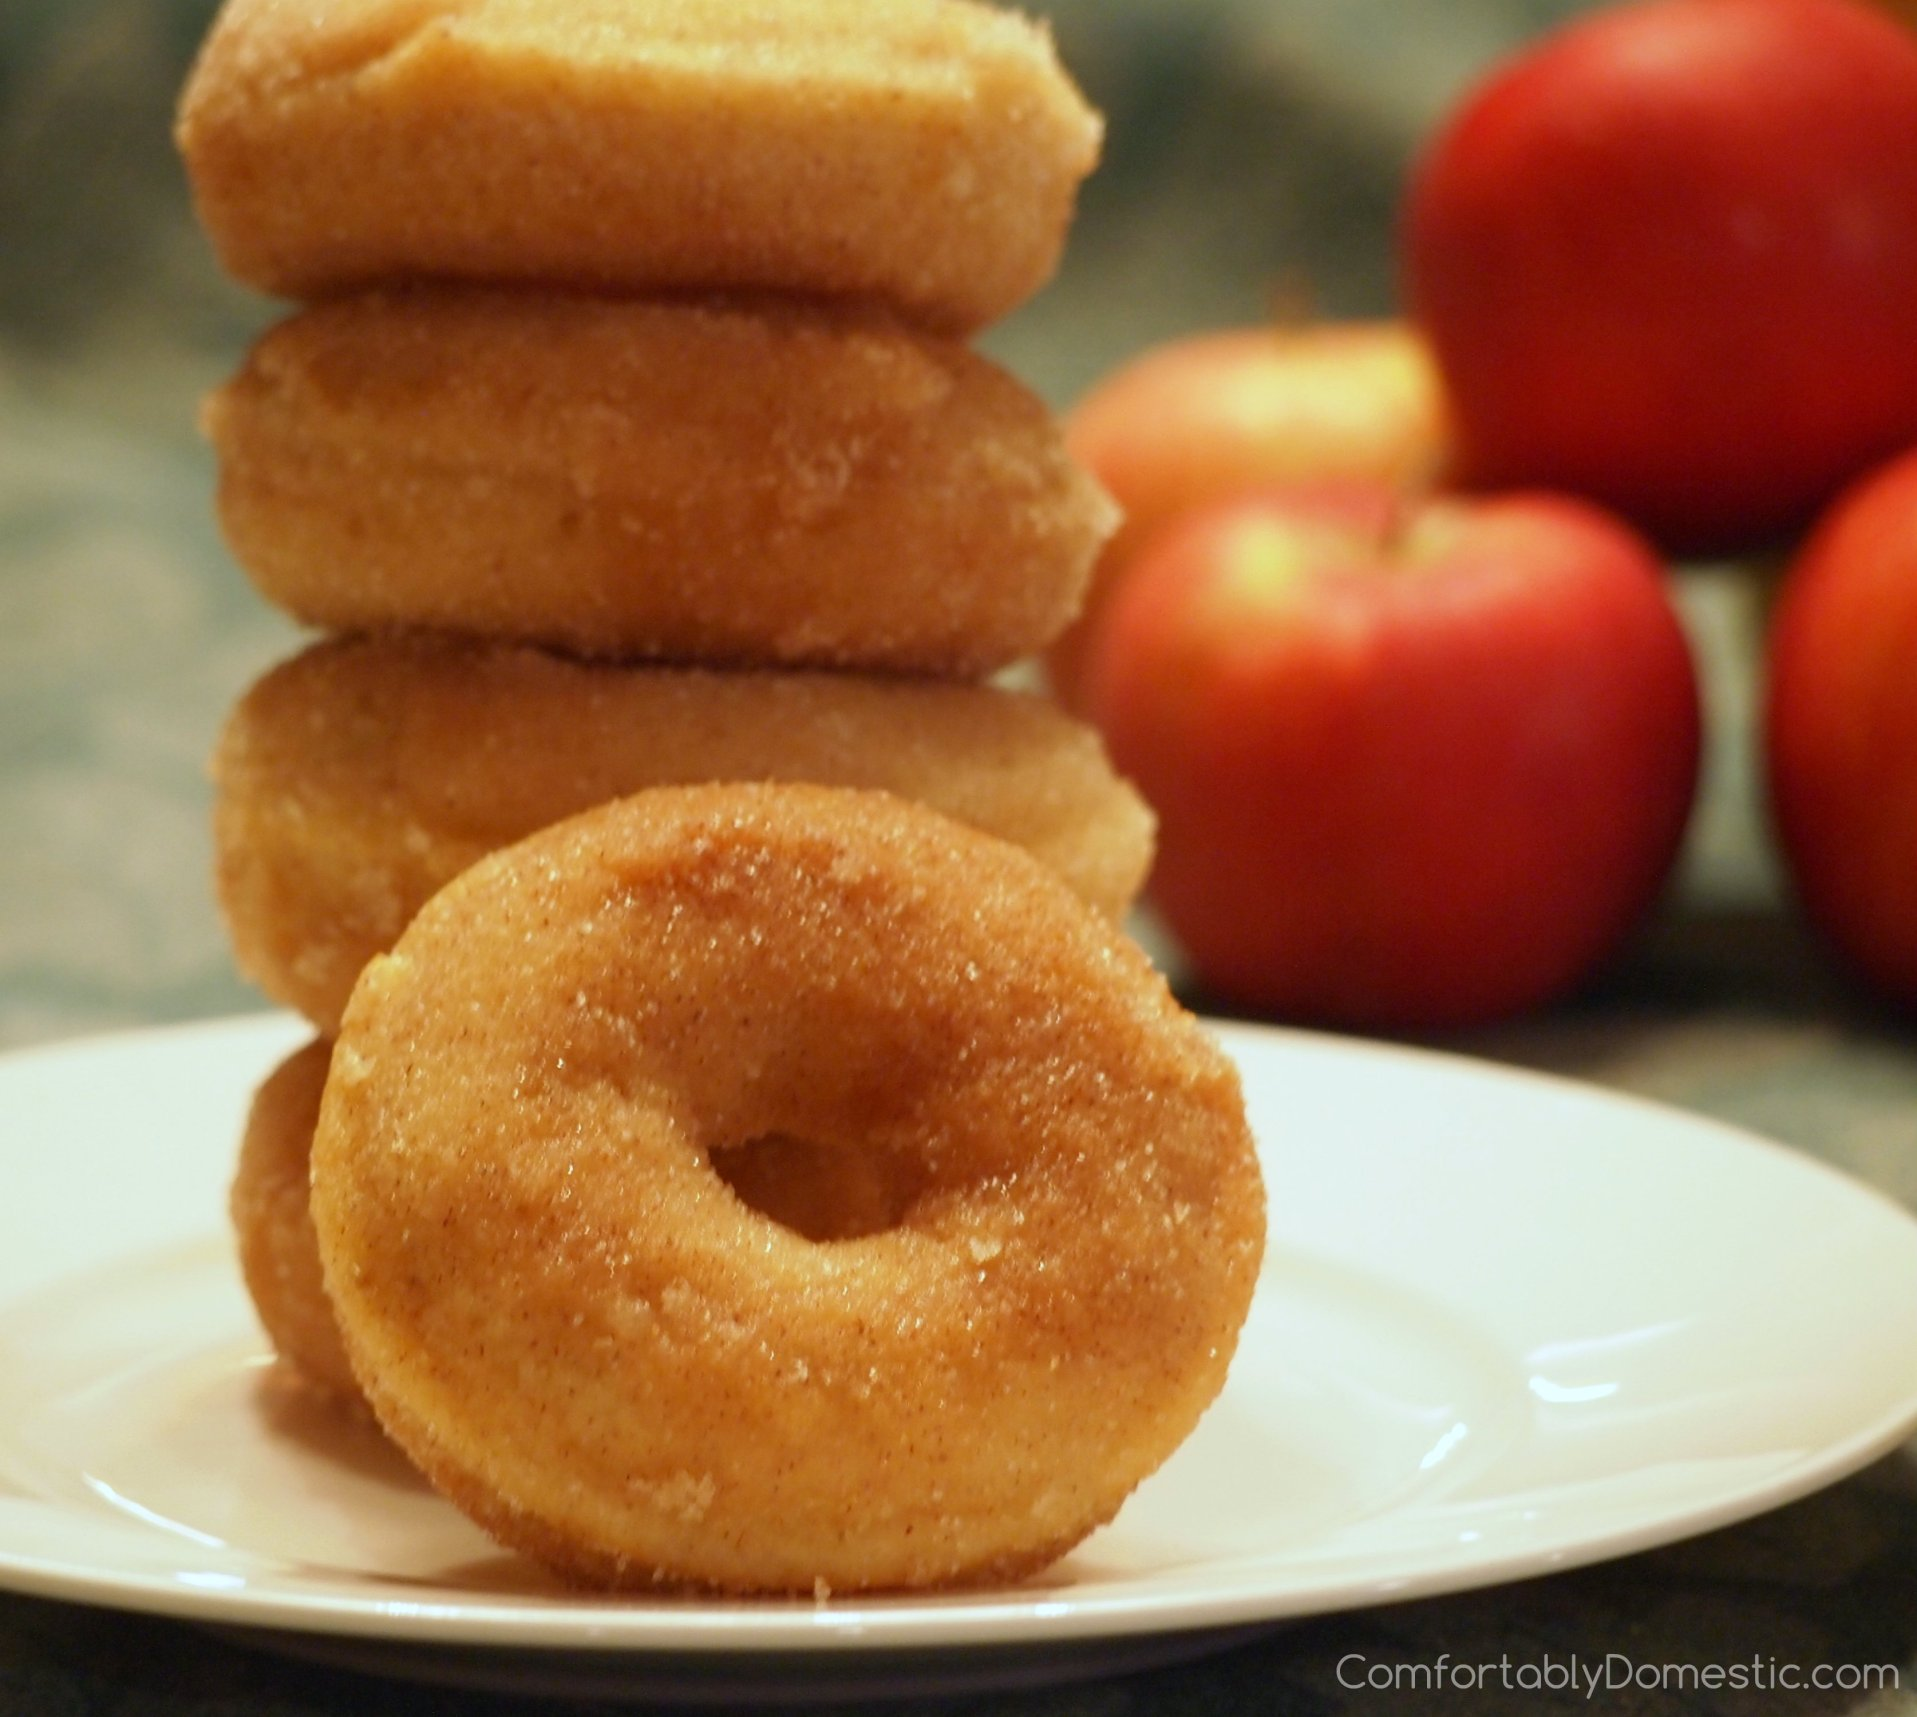 Baked Apple Cinnamon Doughnuts |ComfortablyDomestic.com